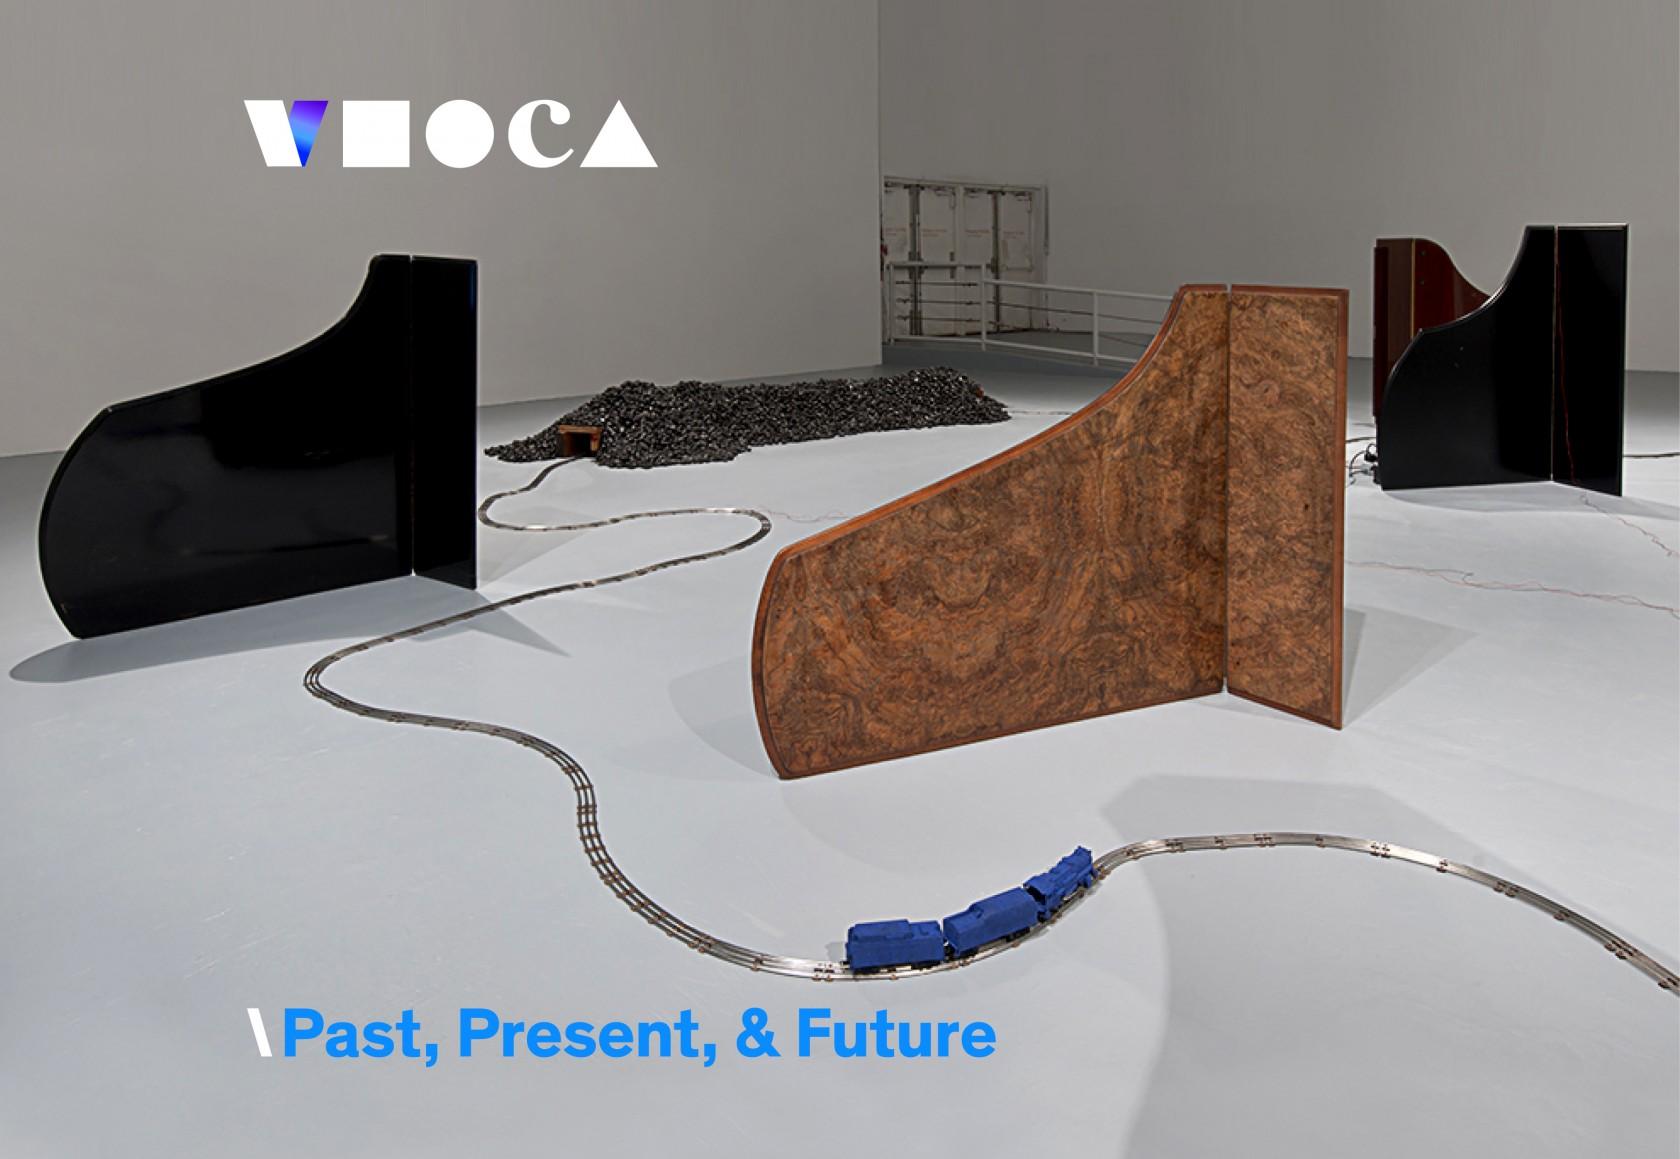 Virtual MOCA: Past, Present, & Future